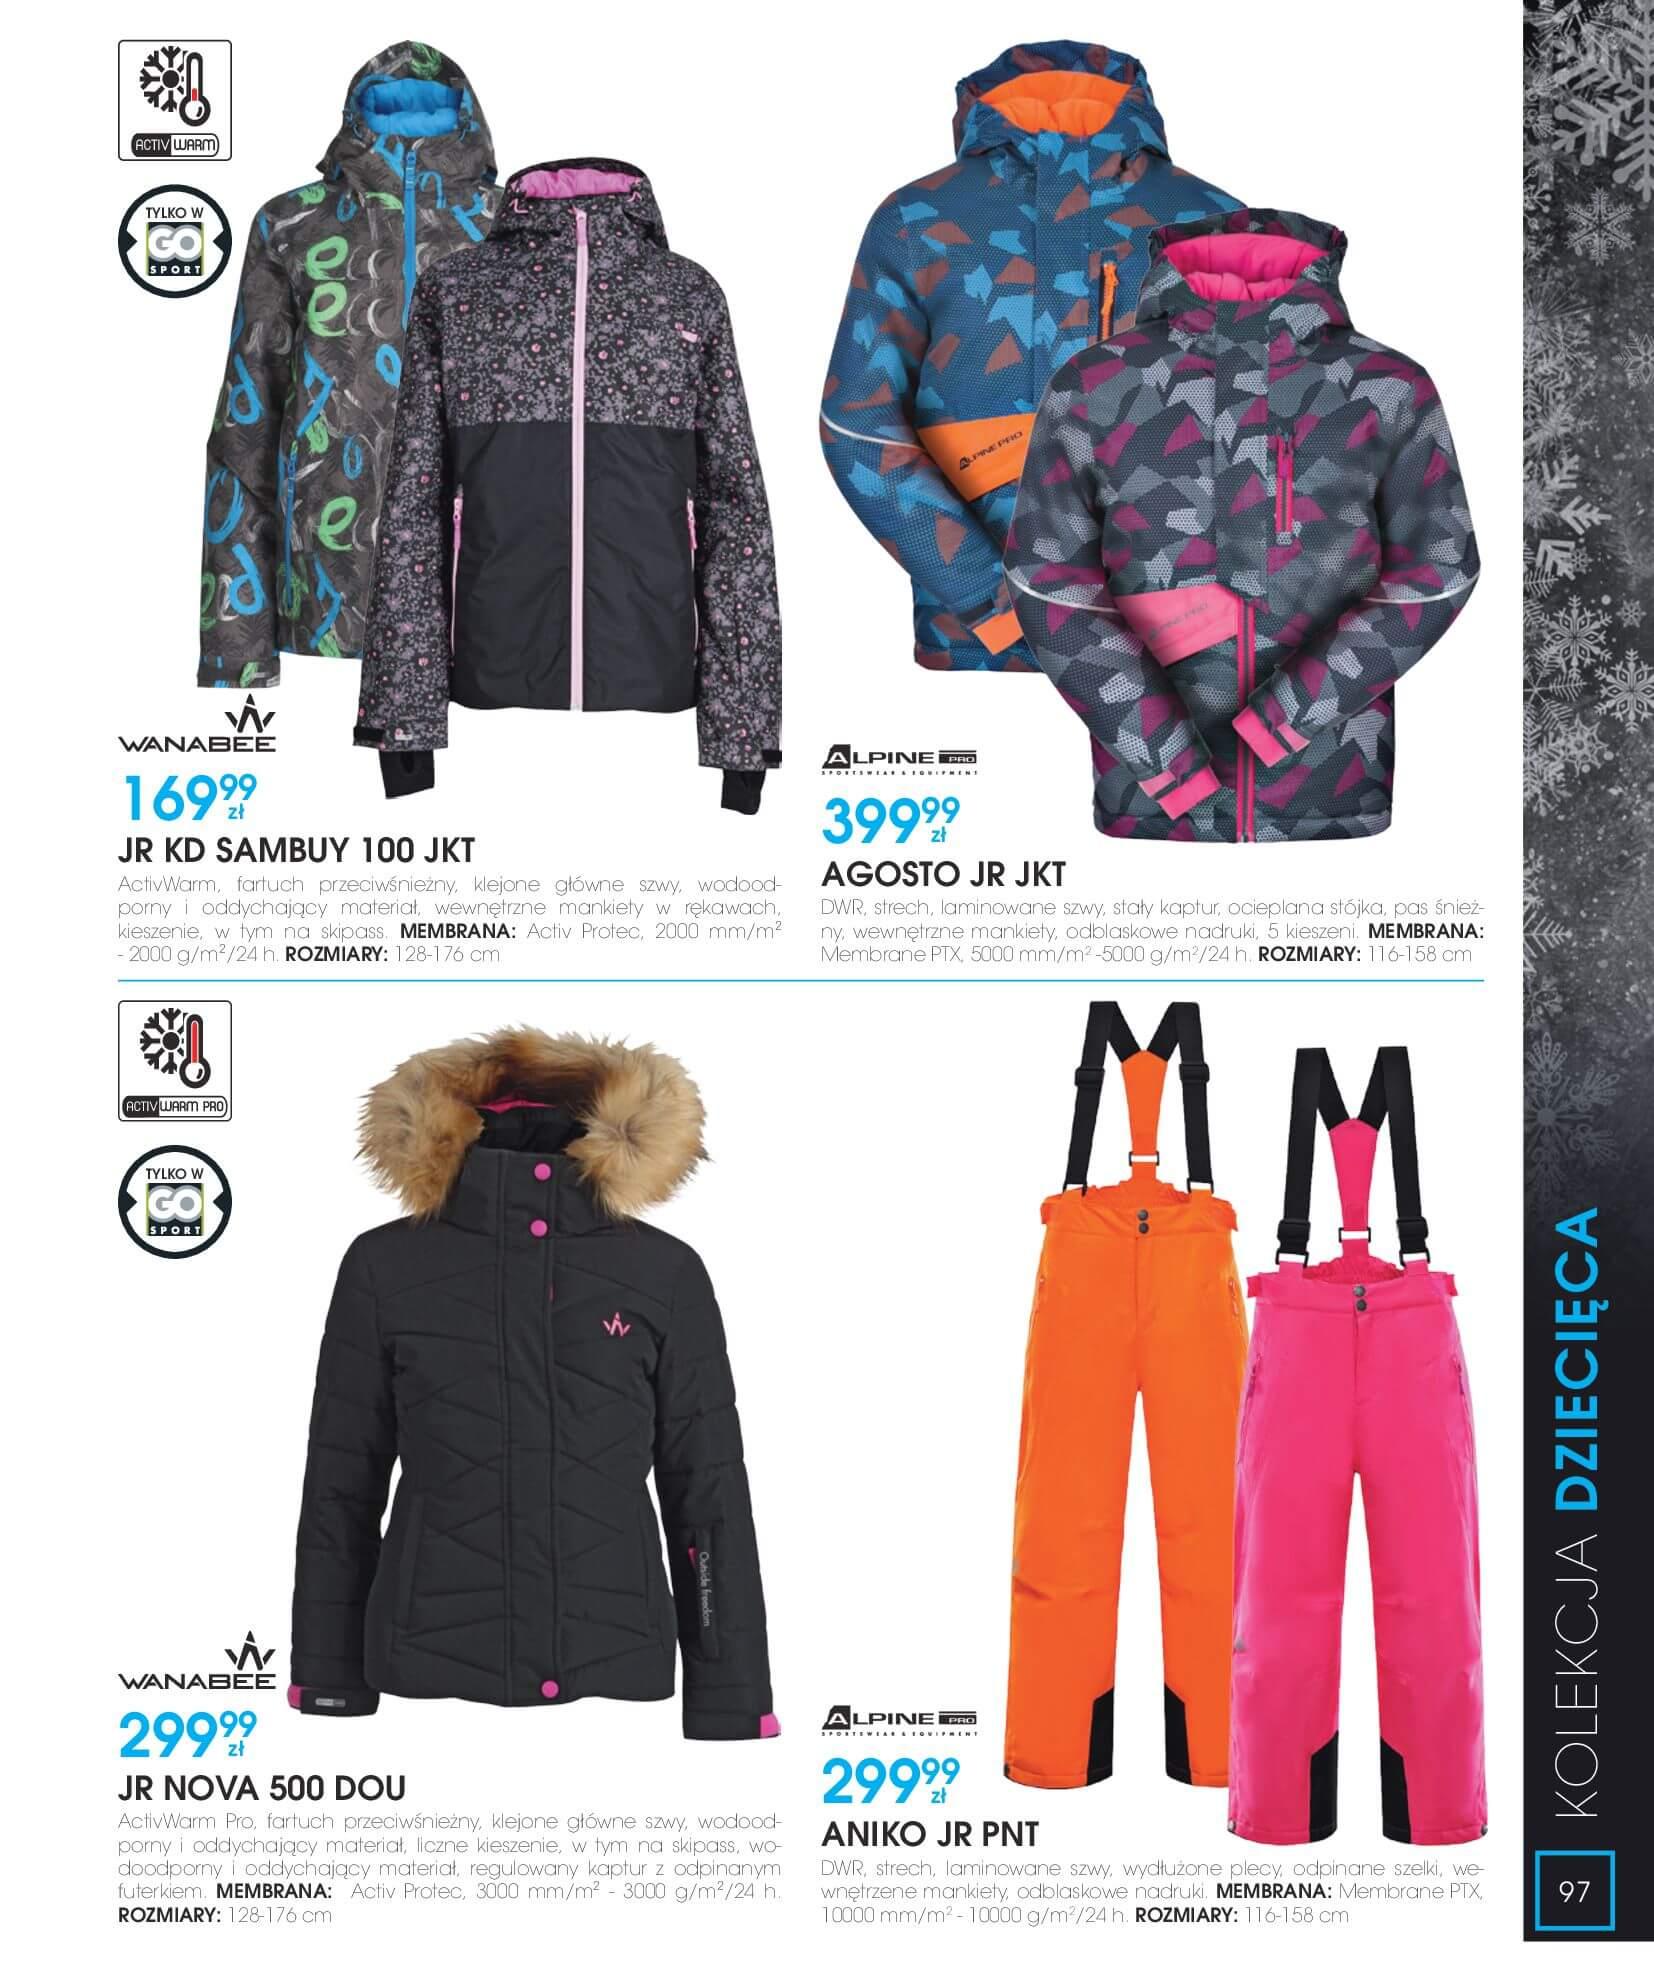 Gazetka Go Sport - Katalog Zima 2017/2018-12.11.2017-28.02.2018-page-97